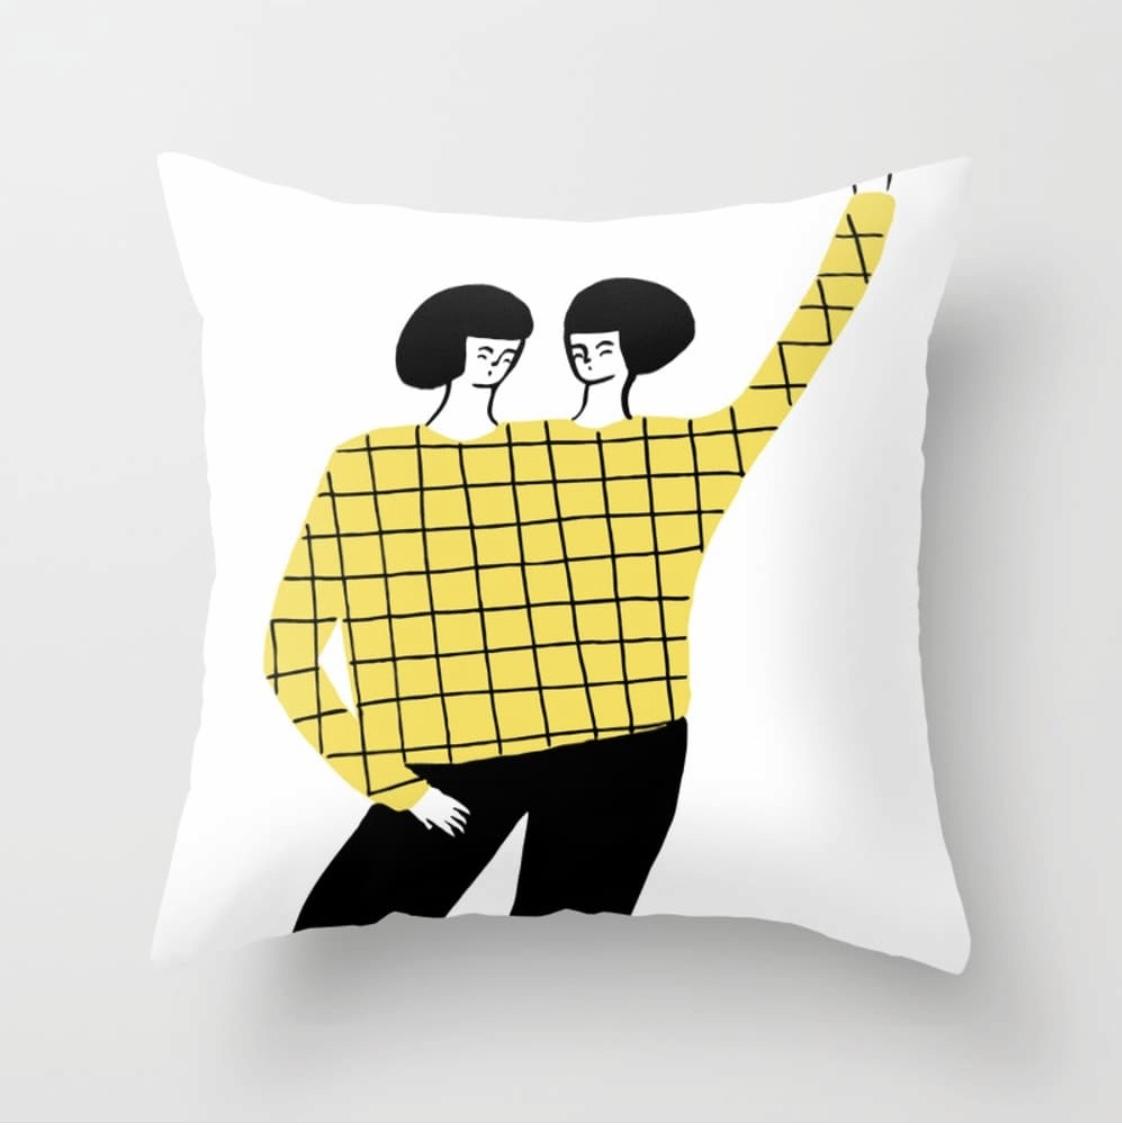 Dancing with myself pillow by Regina Rivas Bigorda @society6